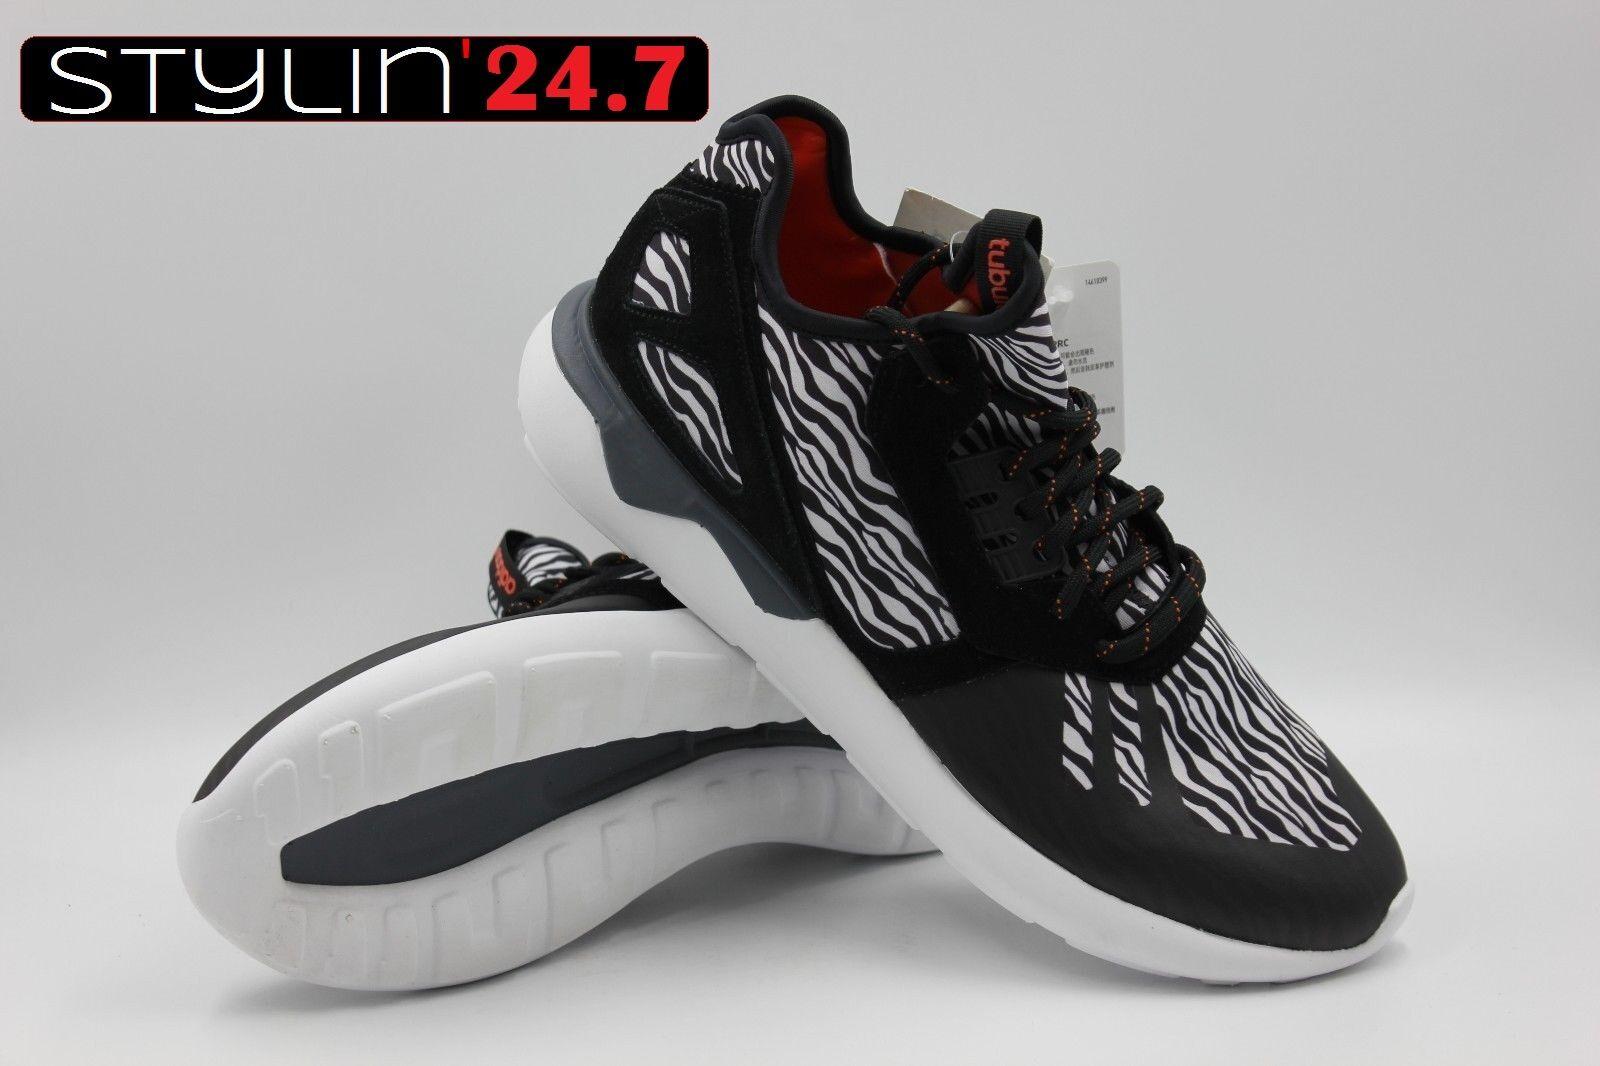 ADIDAS B25531 Adidas Uomo Tubular Runner Zebra Blk/White Compare to the Yezzy